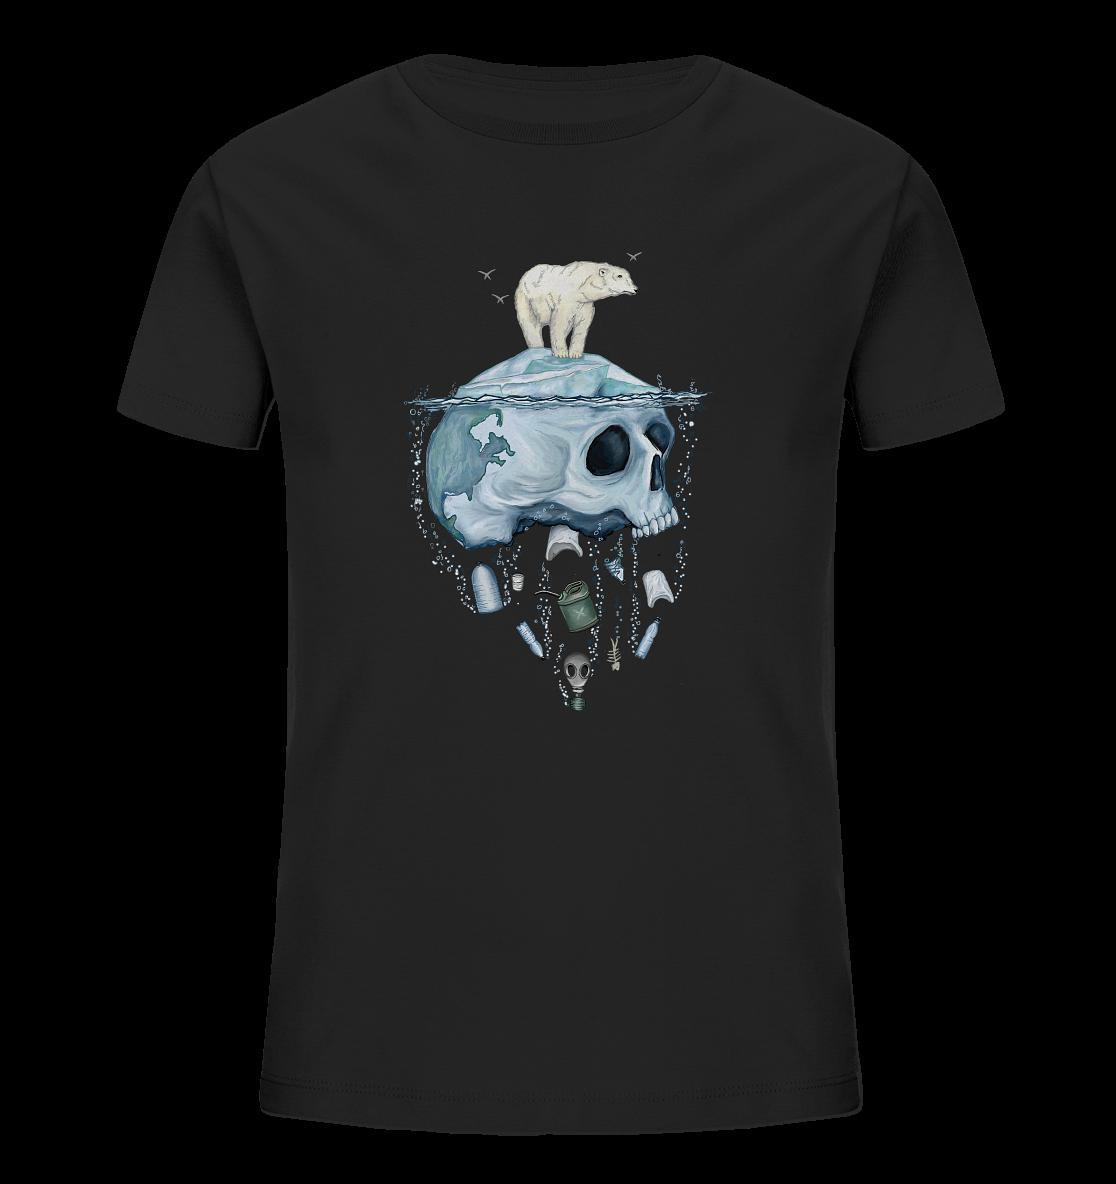 front-kids-organic-shirt-272727-1116x-1.png